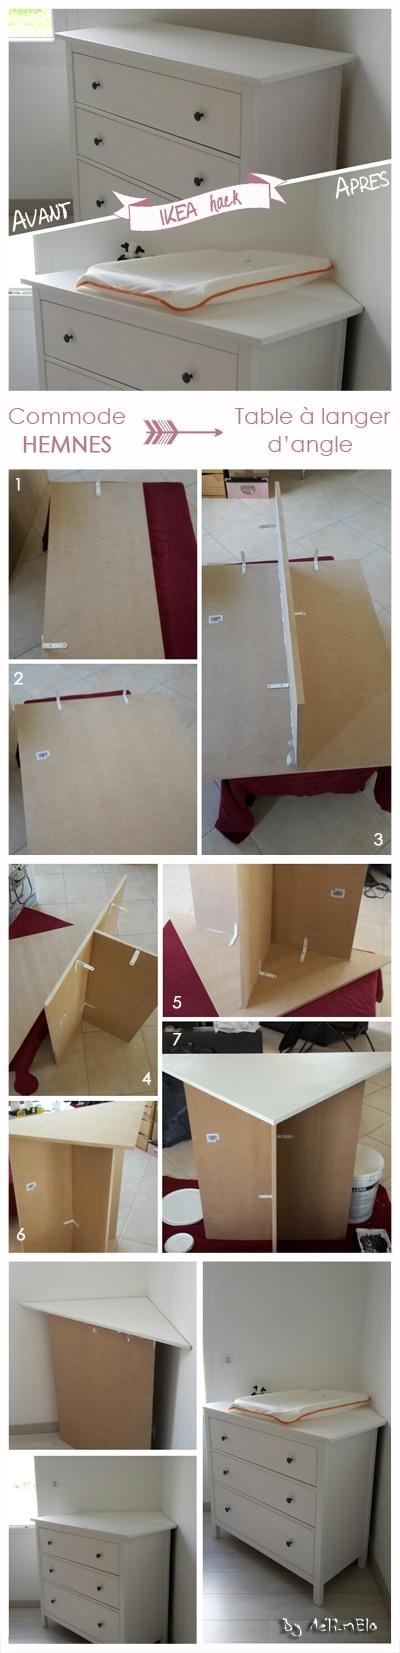 Table à Langer Dangle Diy Ikea Hack